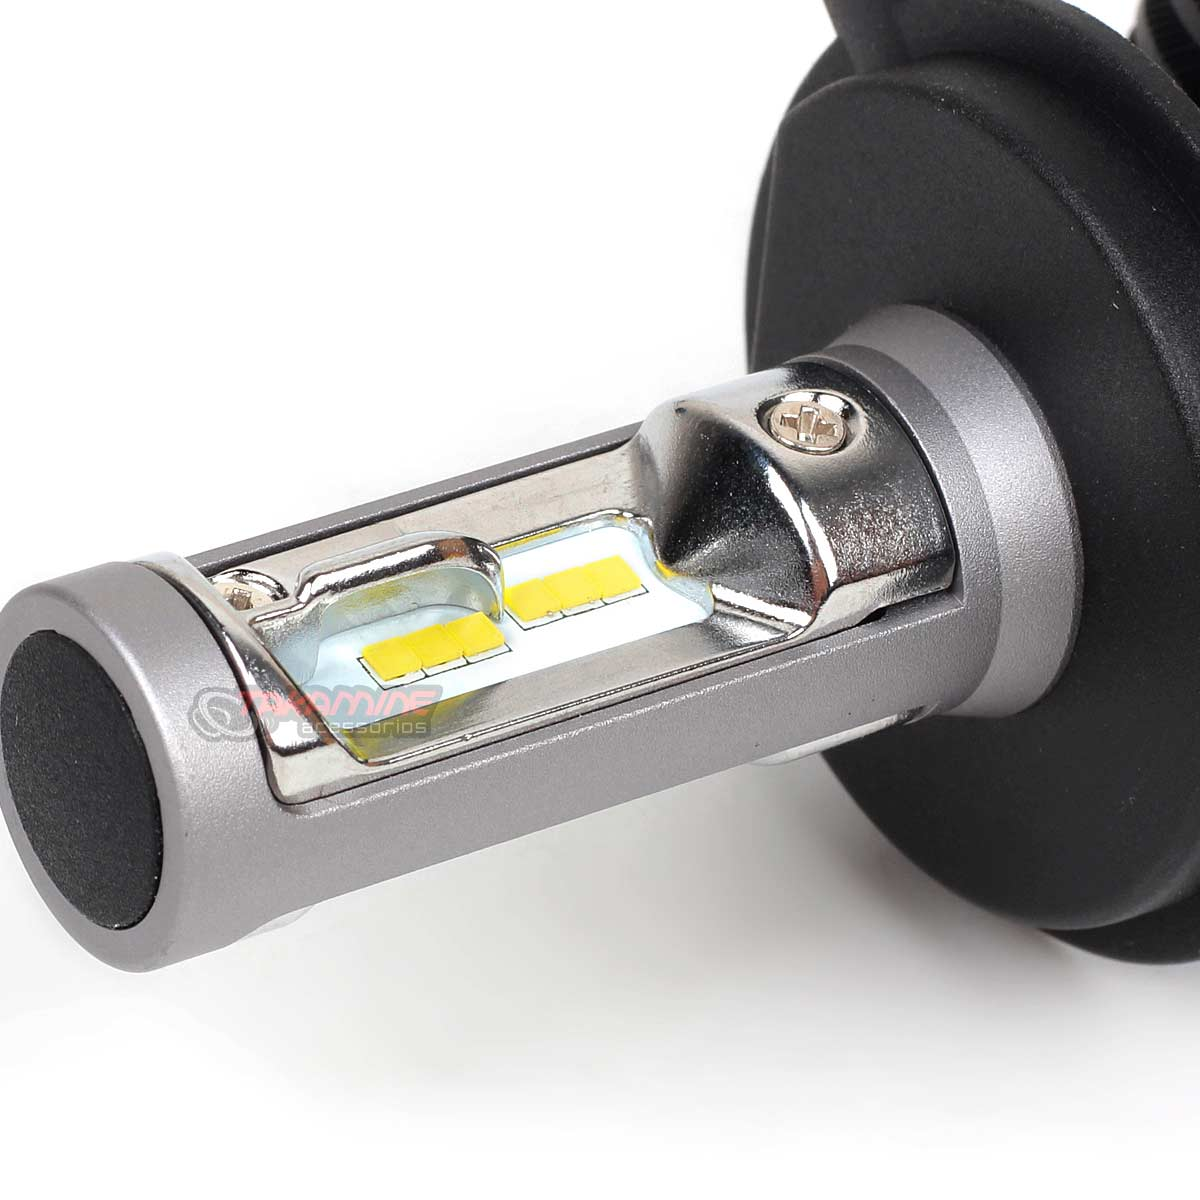 Kit Ultra LED Saveiro G3 farol simples 2000 2001 2002 2003 2004 2005 tipo xenon Shocklight farol alto e baixo H4 50W